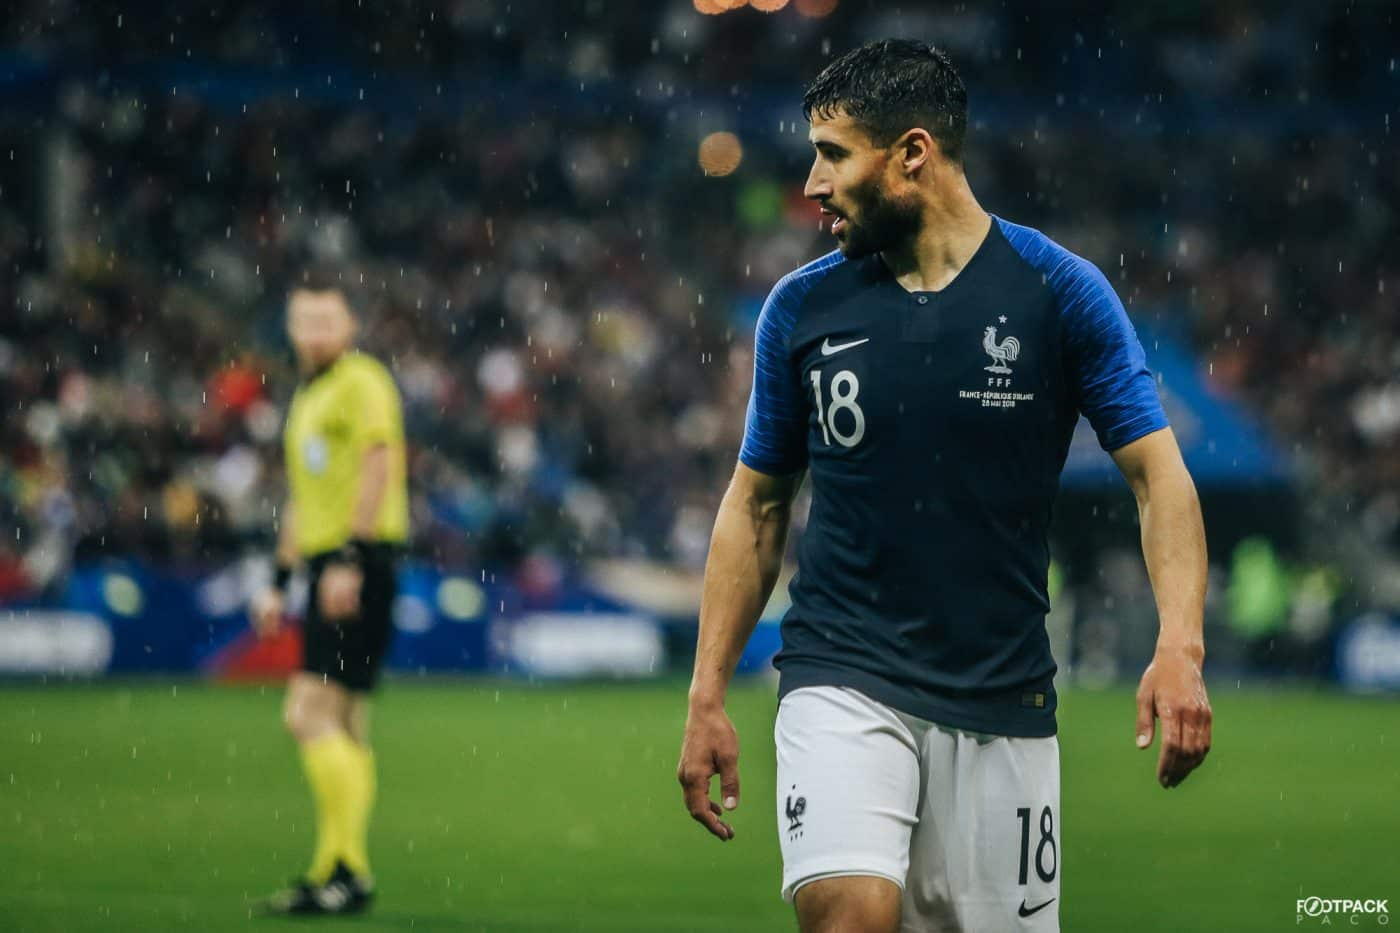 maillot-equipe-de-france-domicile-coupe-du-monde-2018-footpack